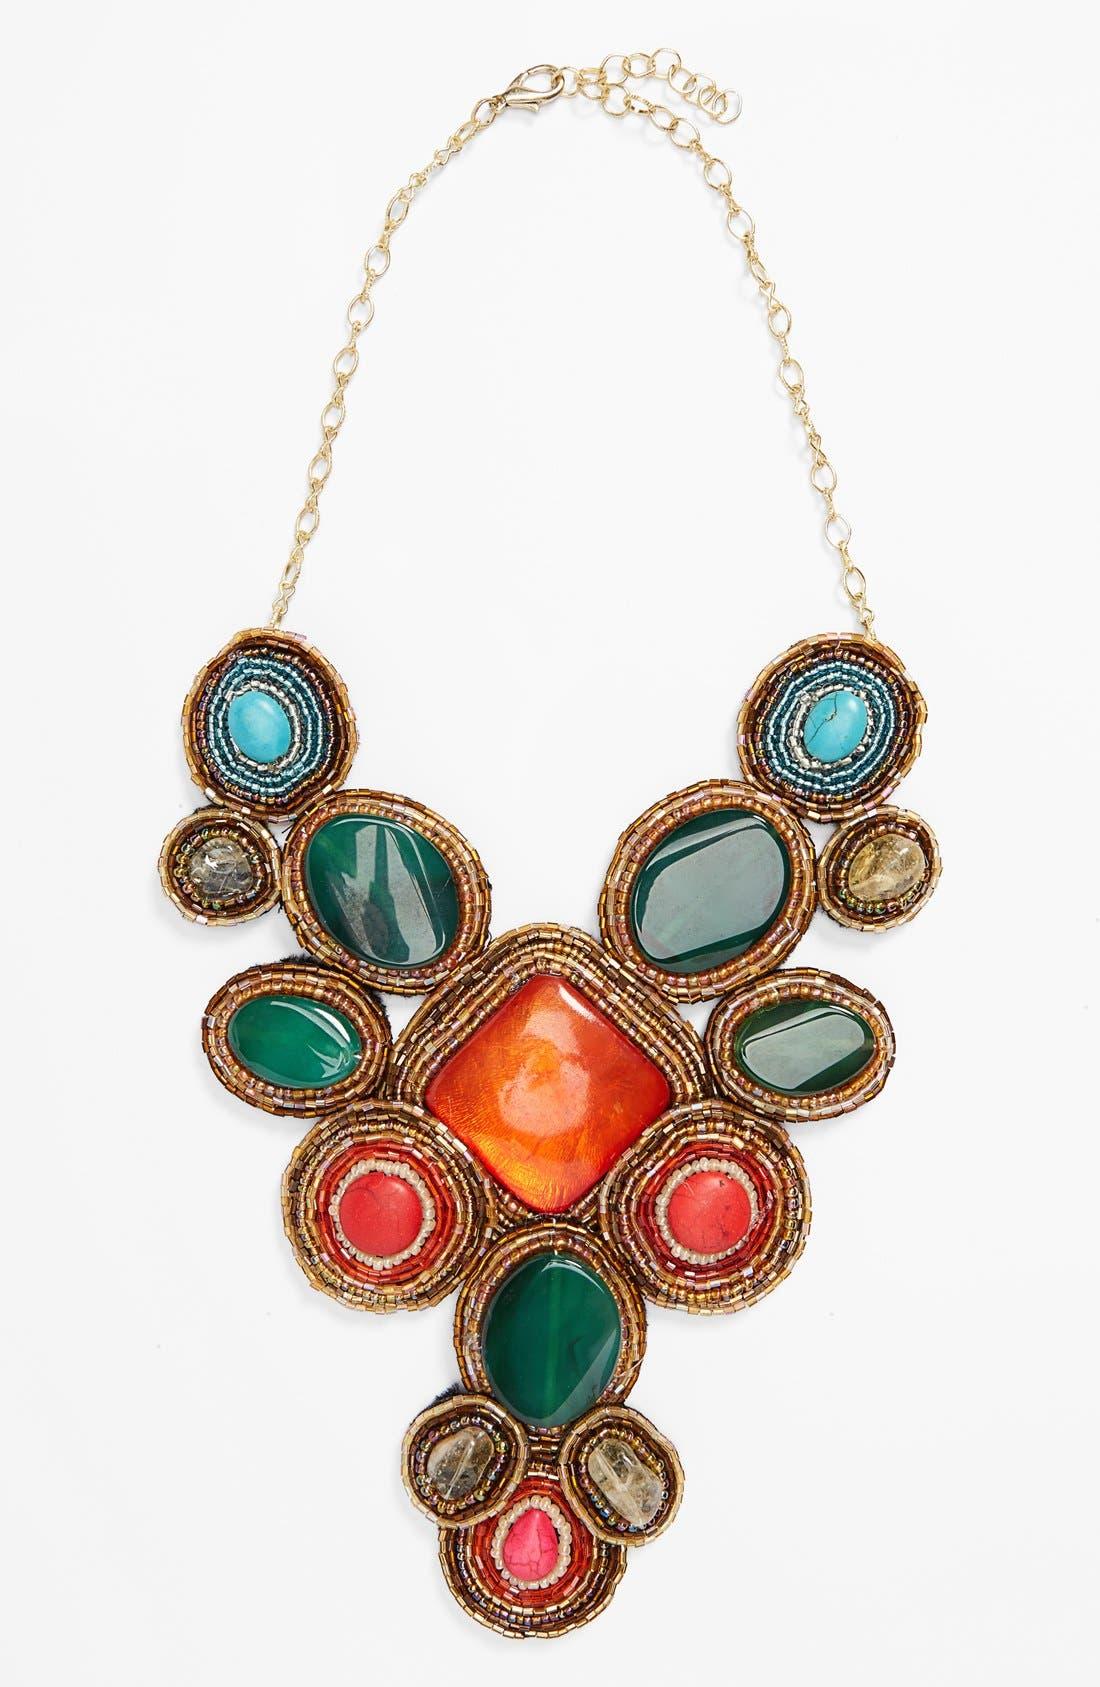 Main Image - Tasha 'Beads of Glory' Collar Necklace